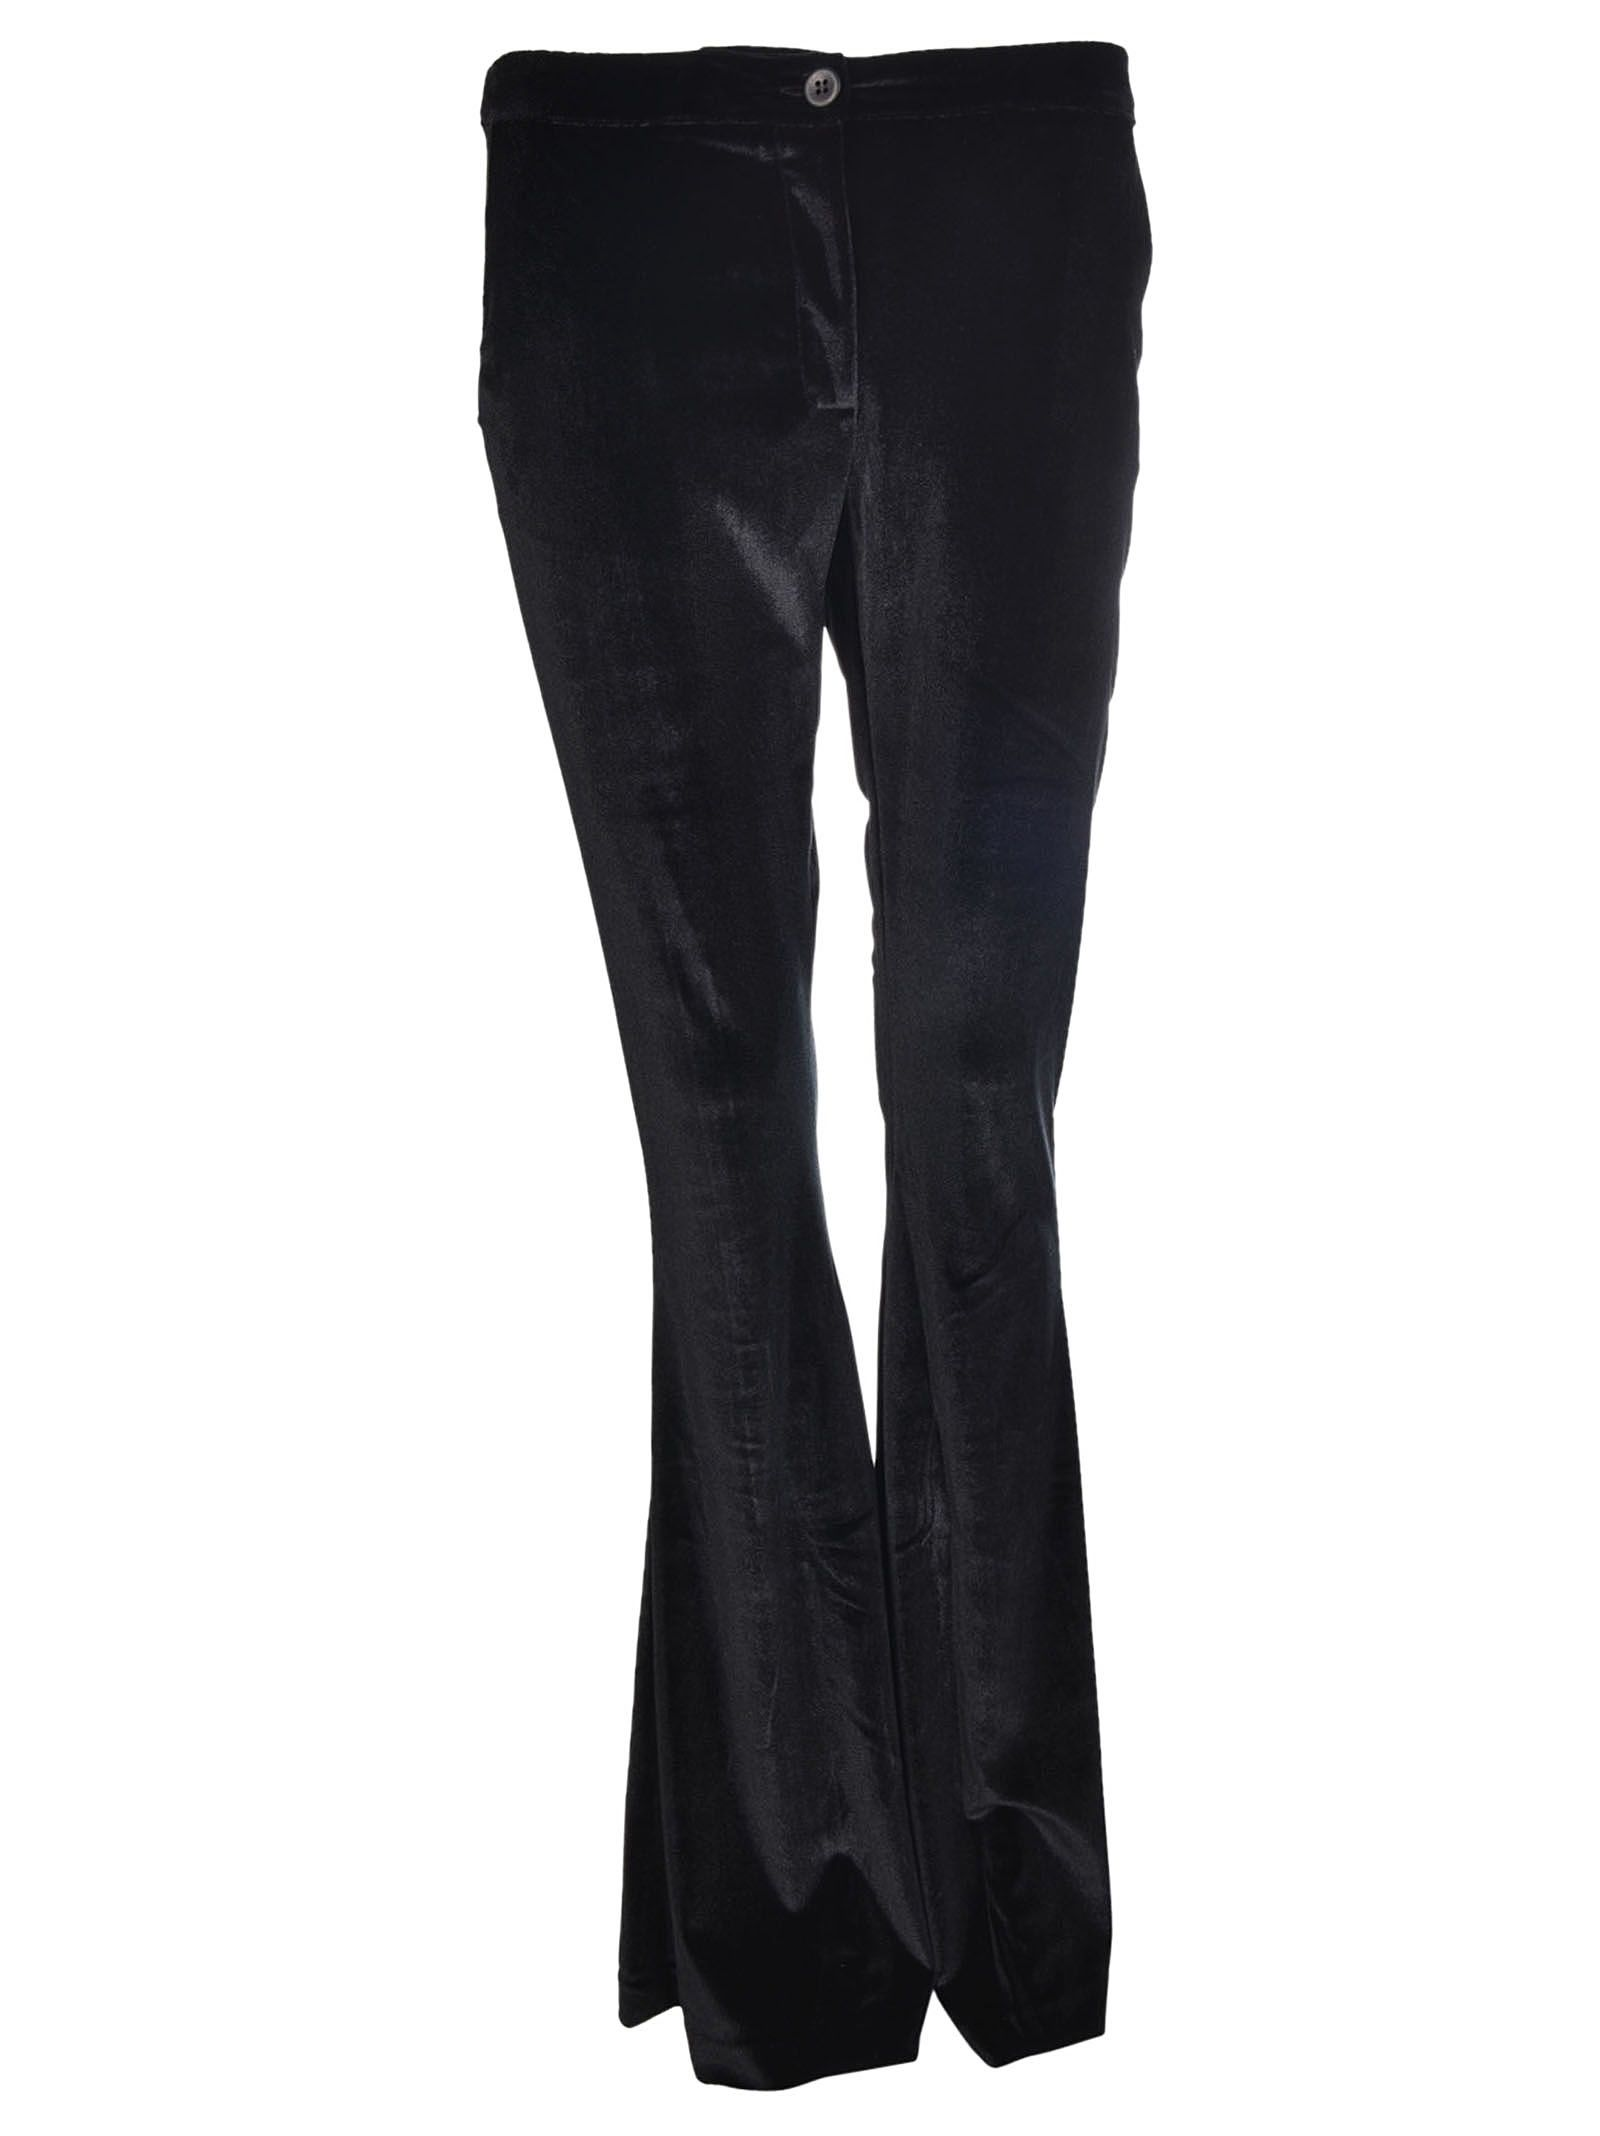 Black Coral Cloe Flare Leg Trousers